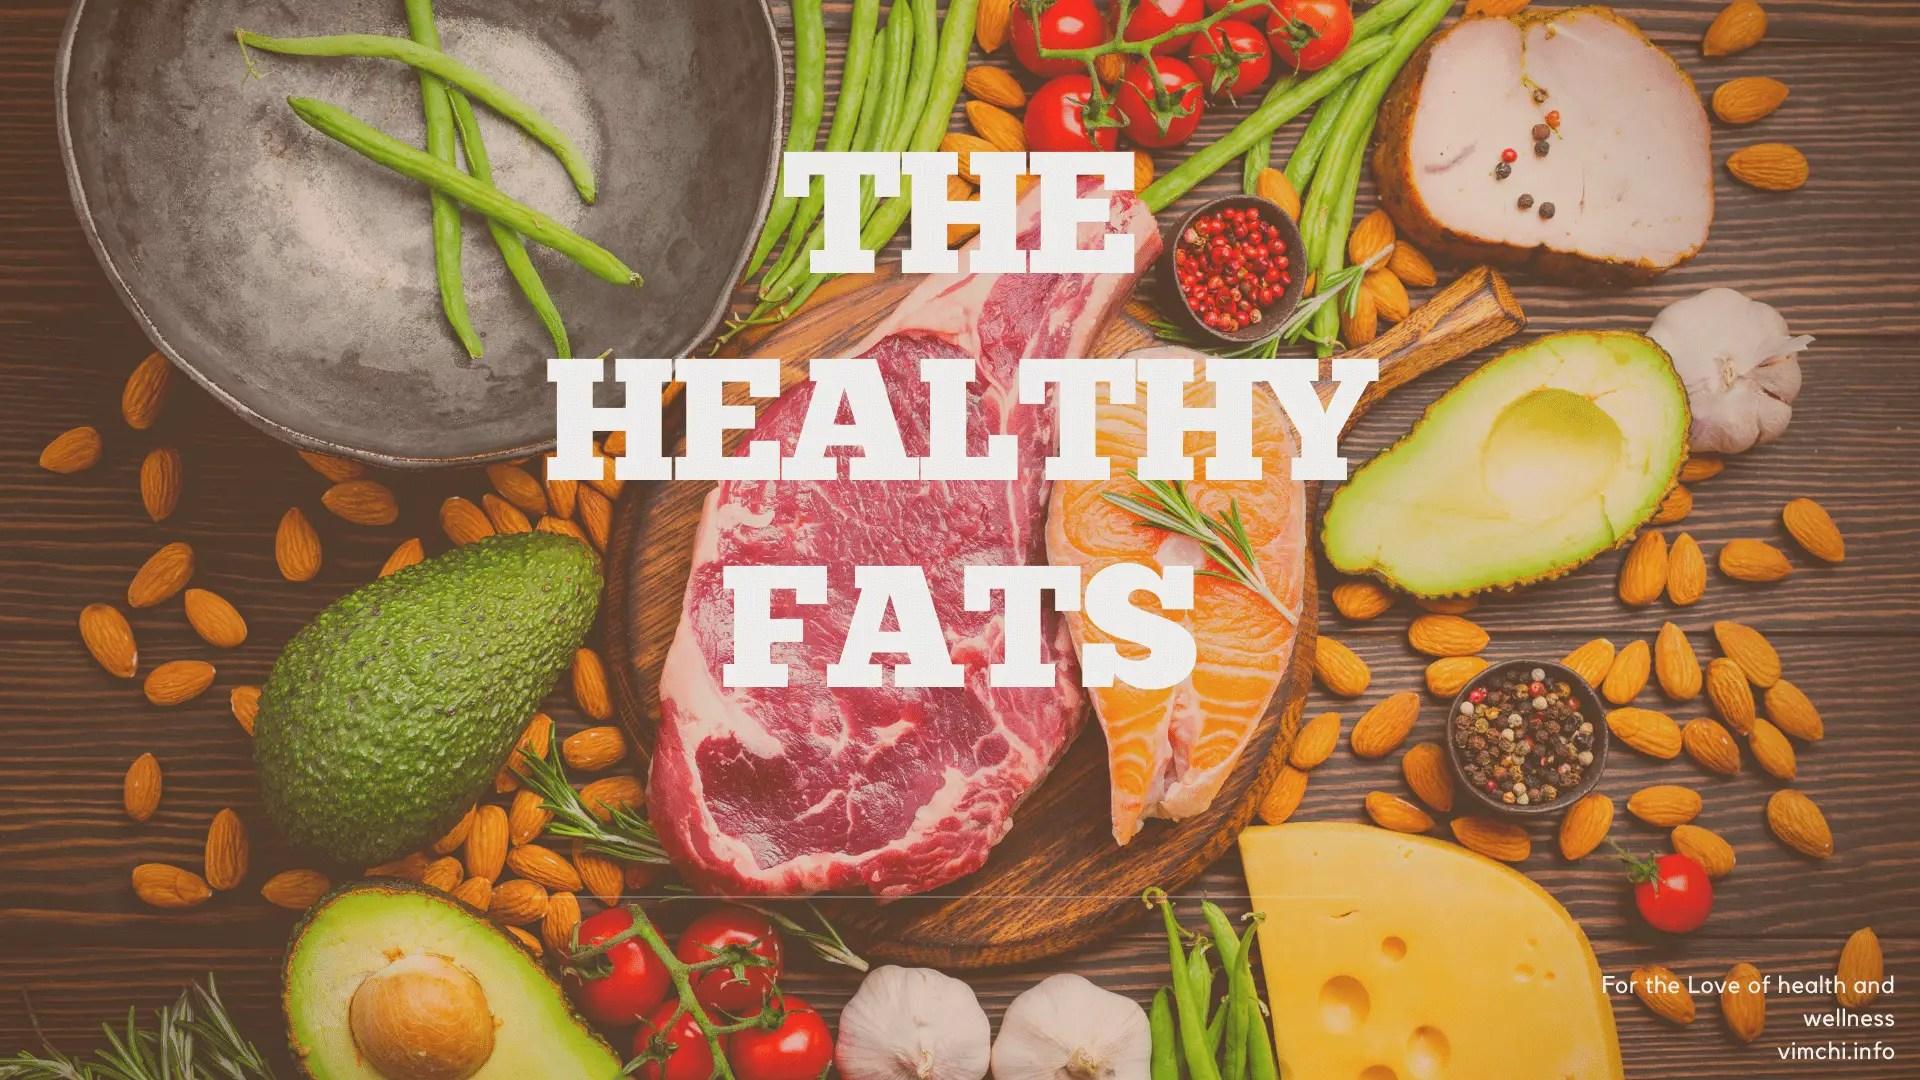 keto diet healthy fats